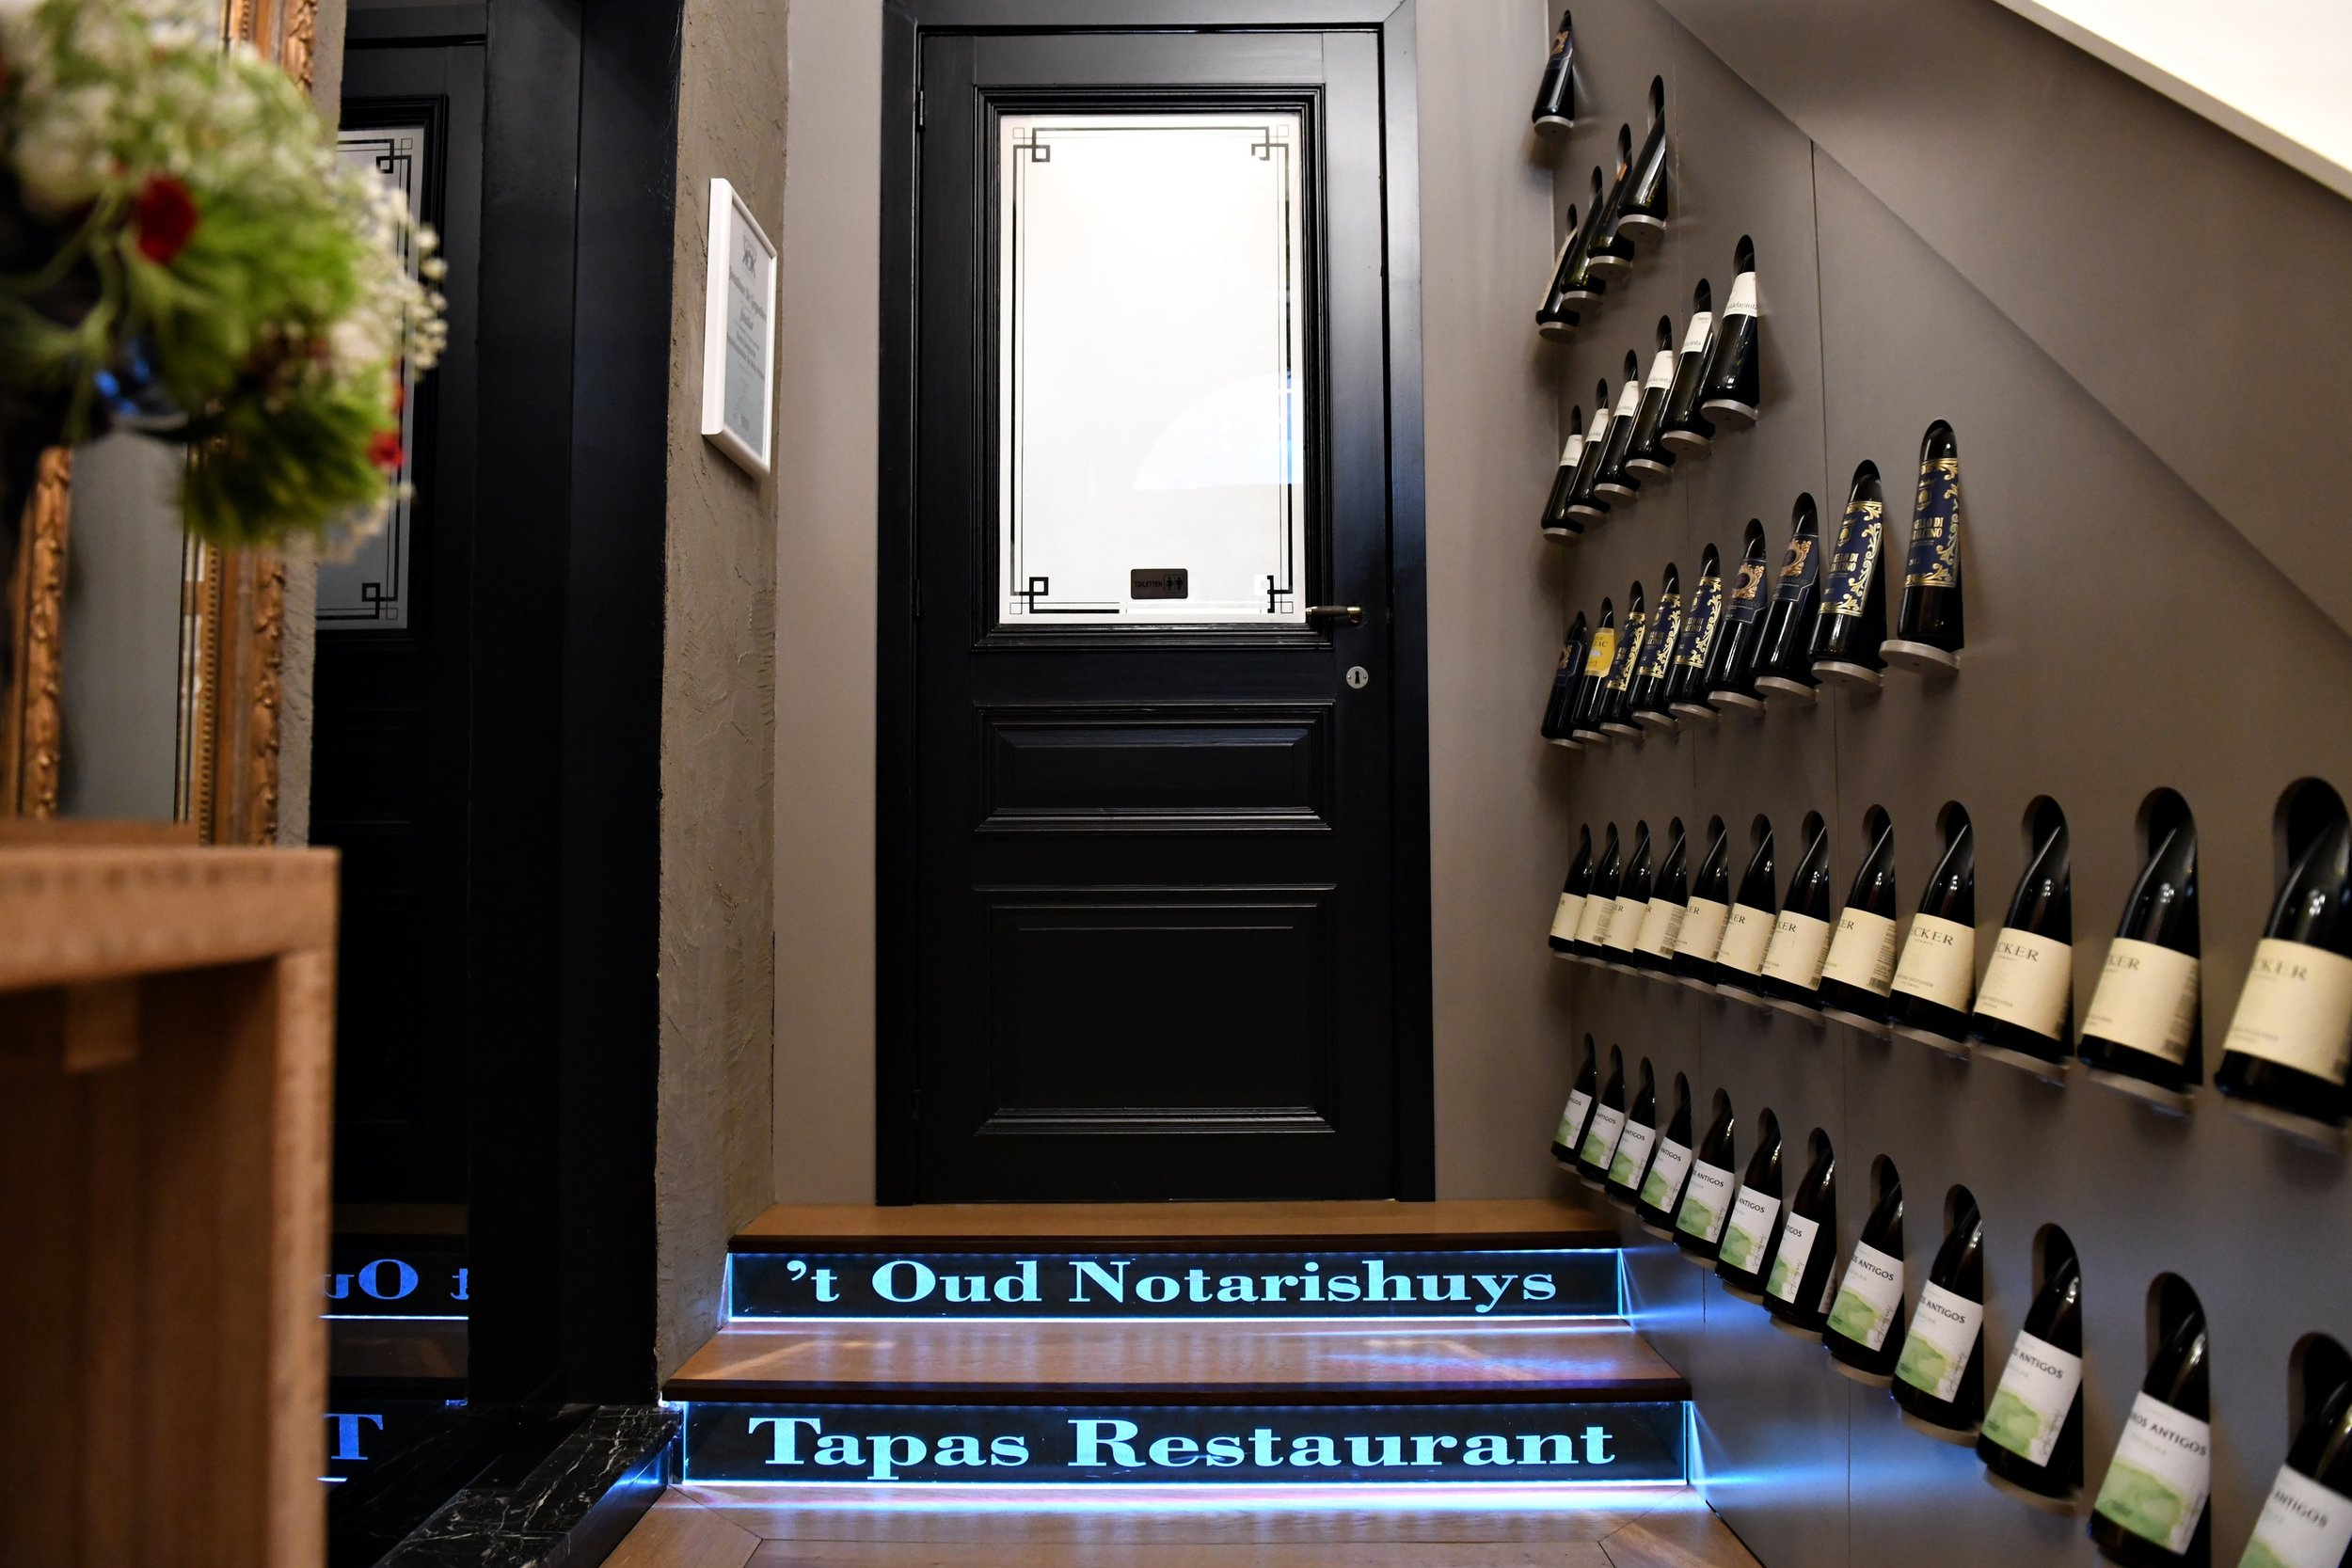 25 restaurant brasserie oud notarishuis ninove bart albrecht tablefever .jpg